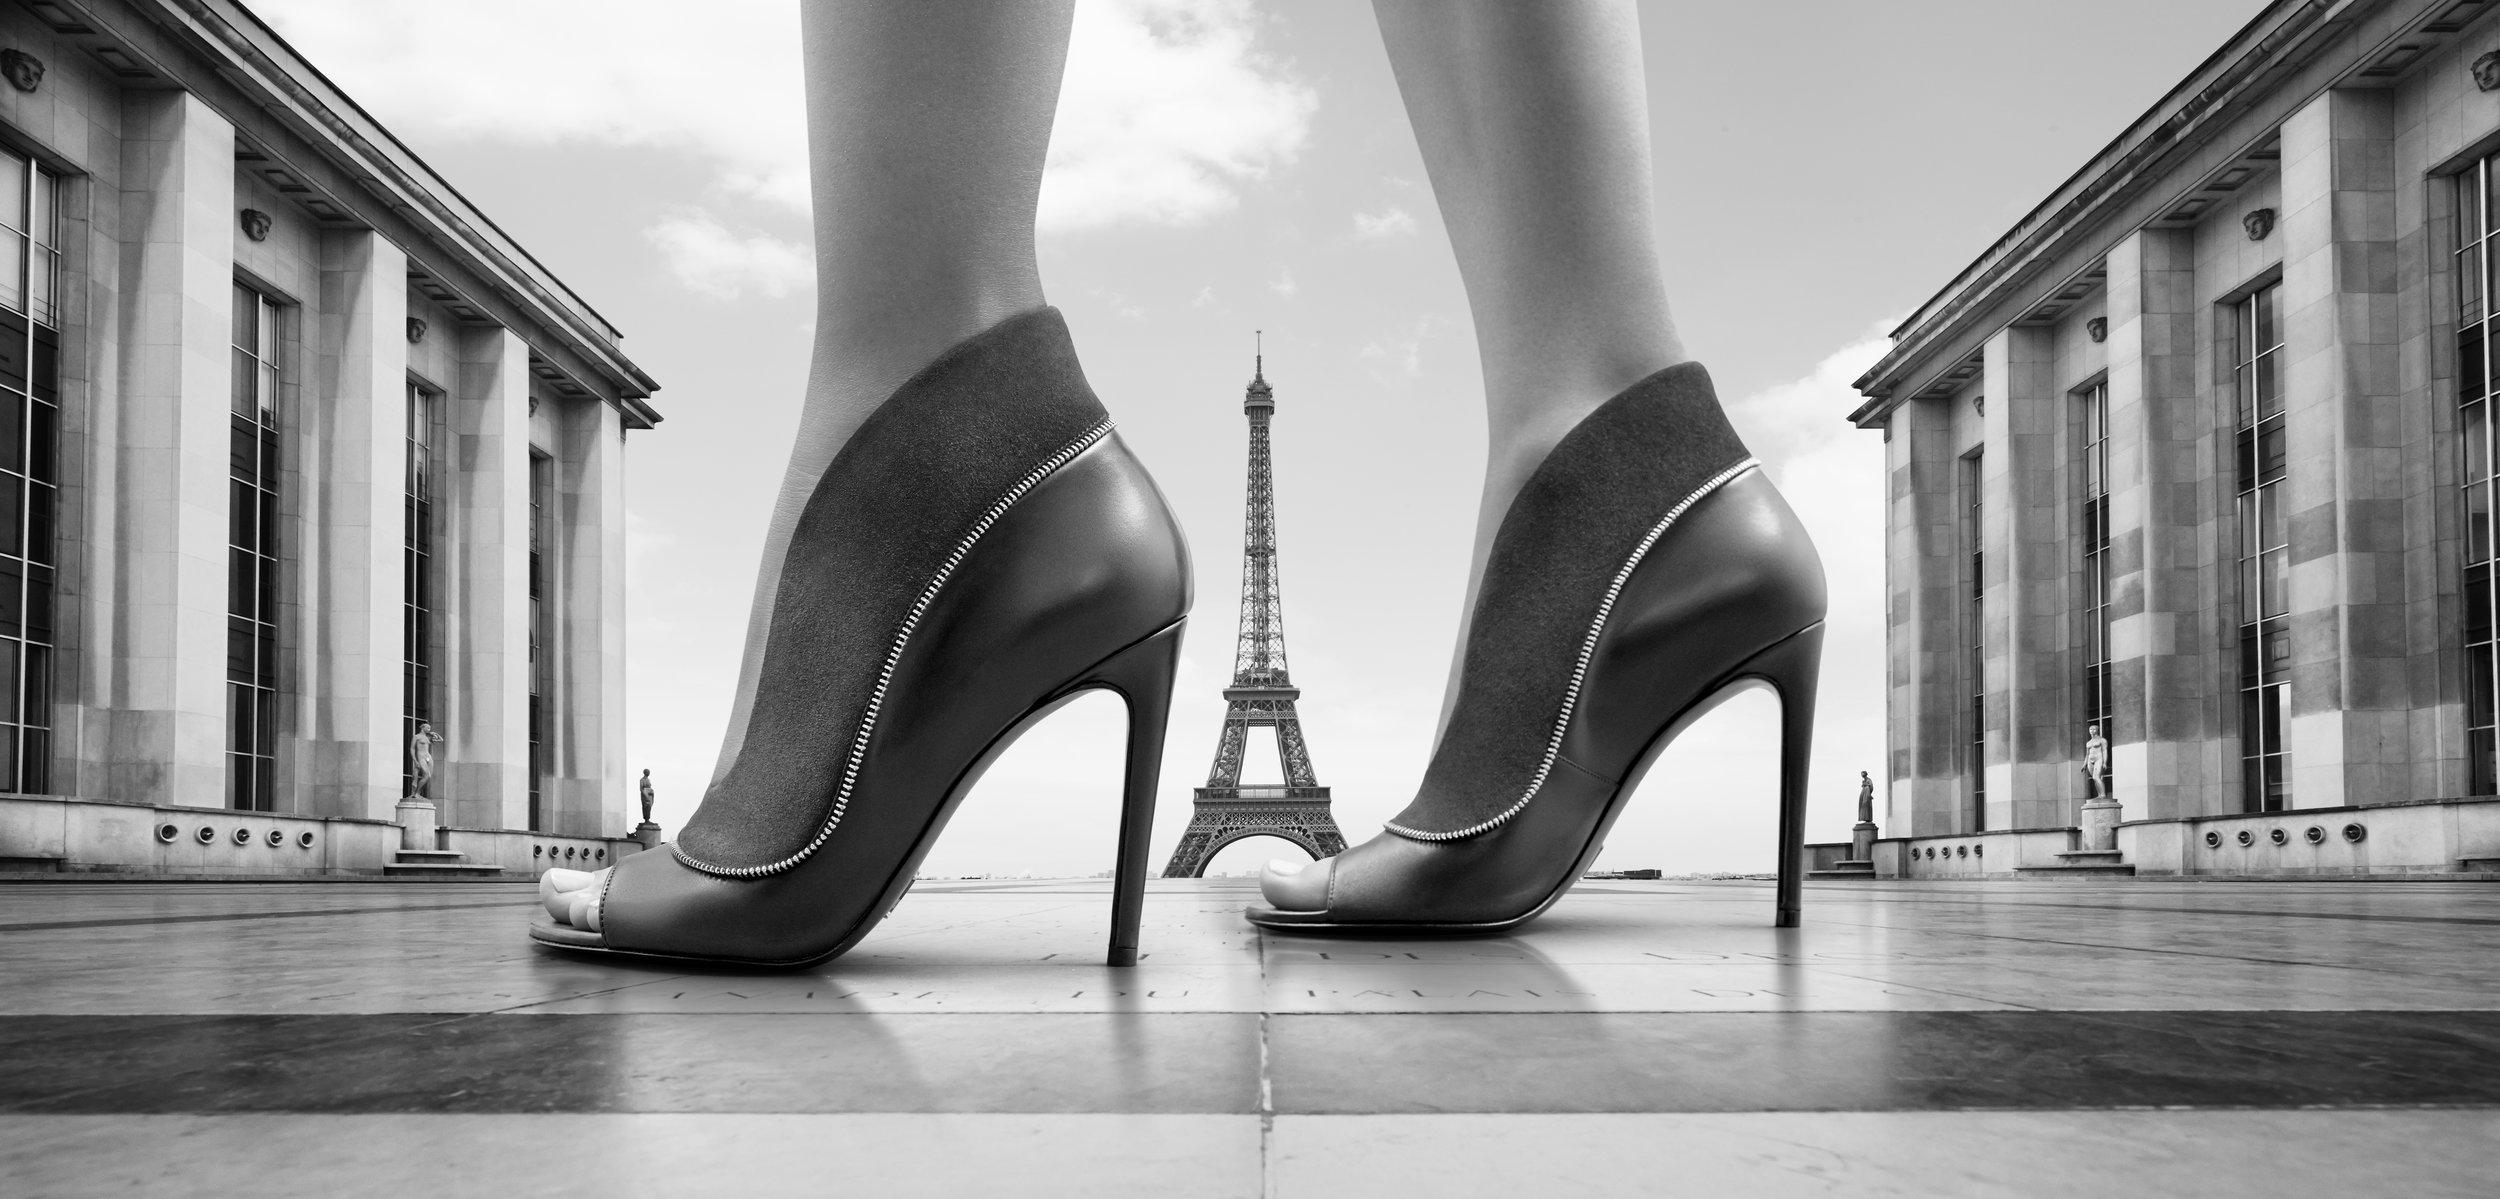 Trocadero, Paris. For Louis Vuitton.